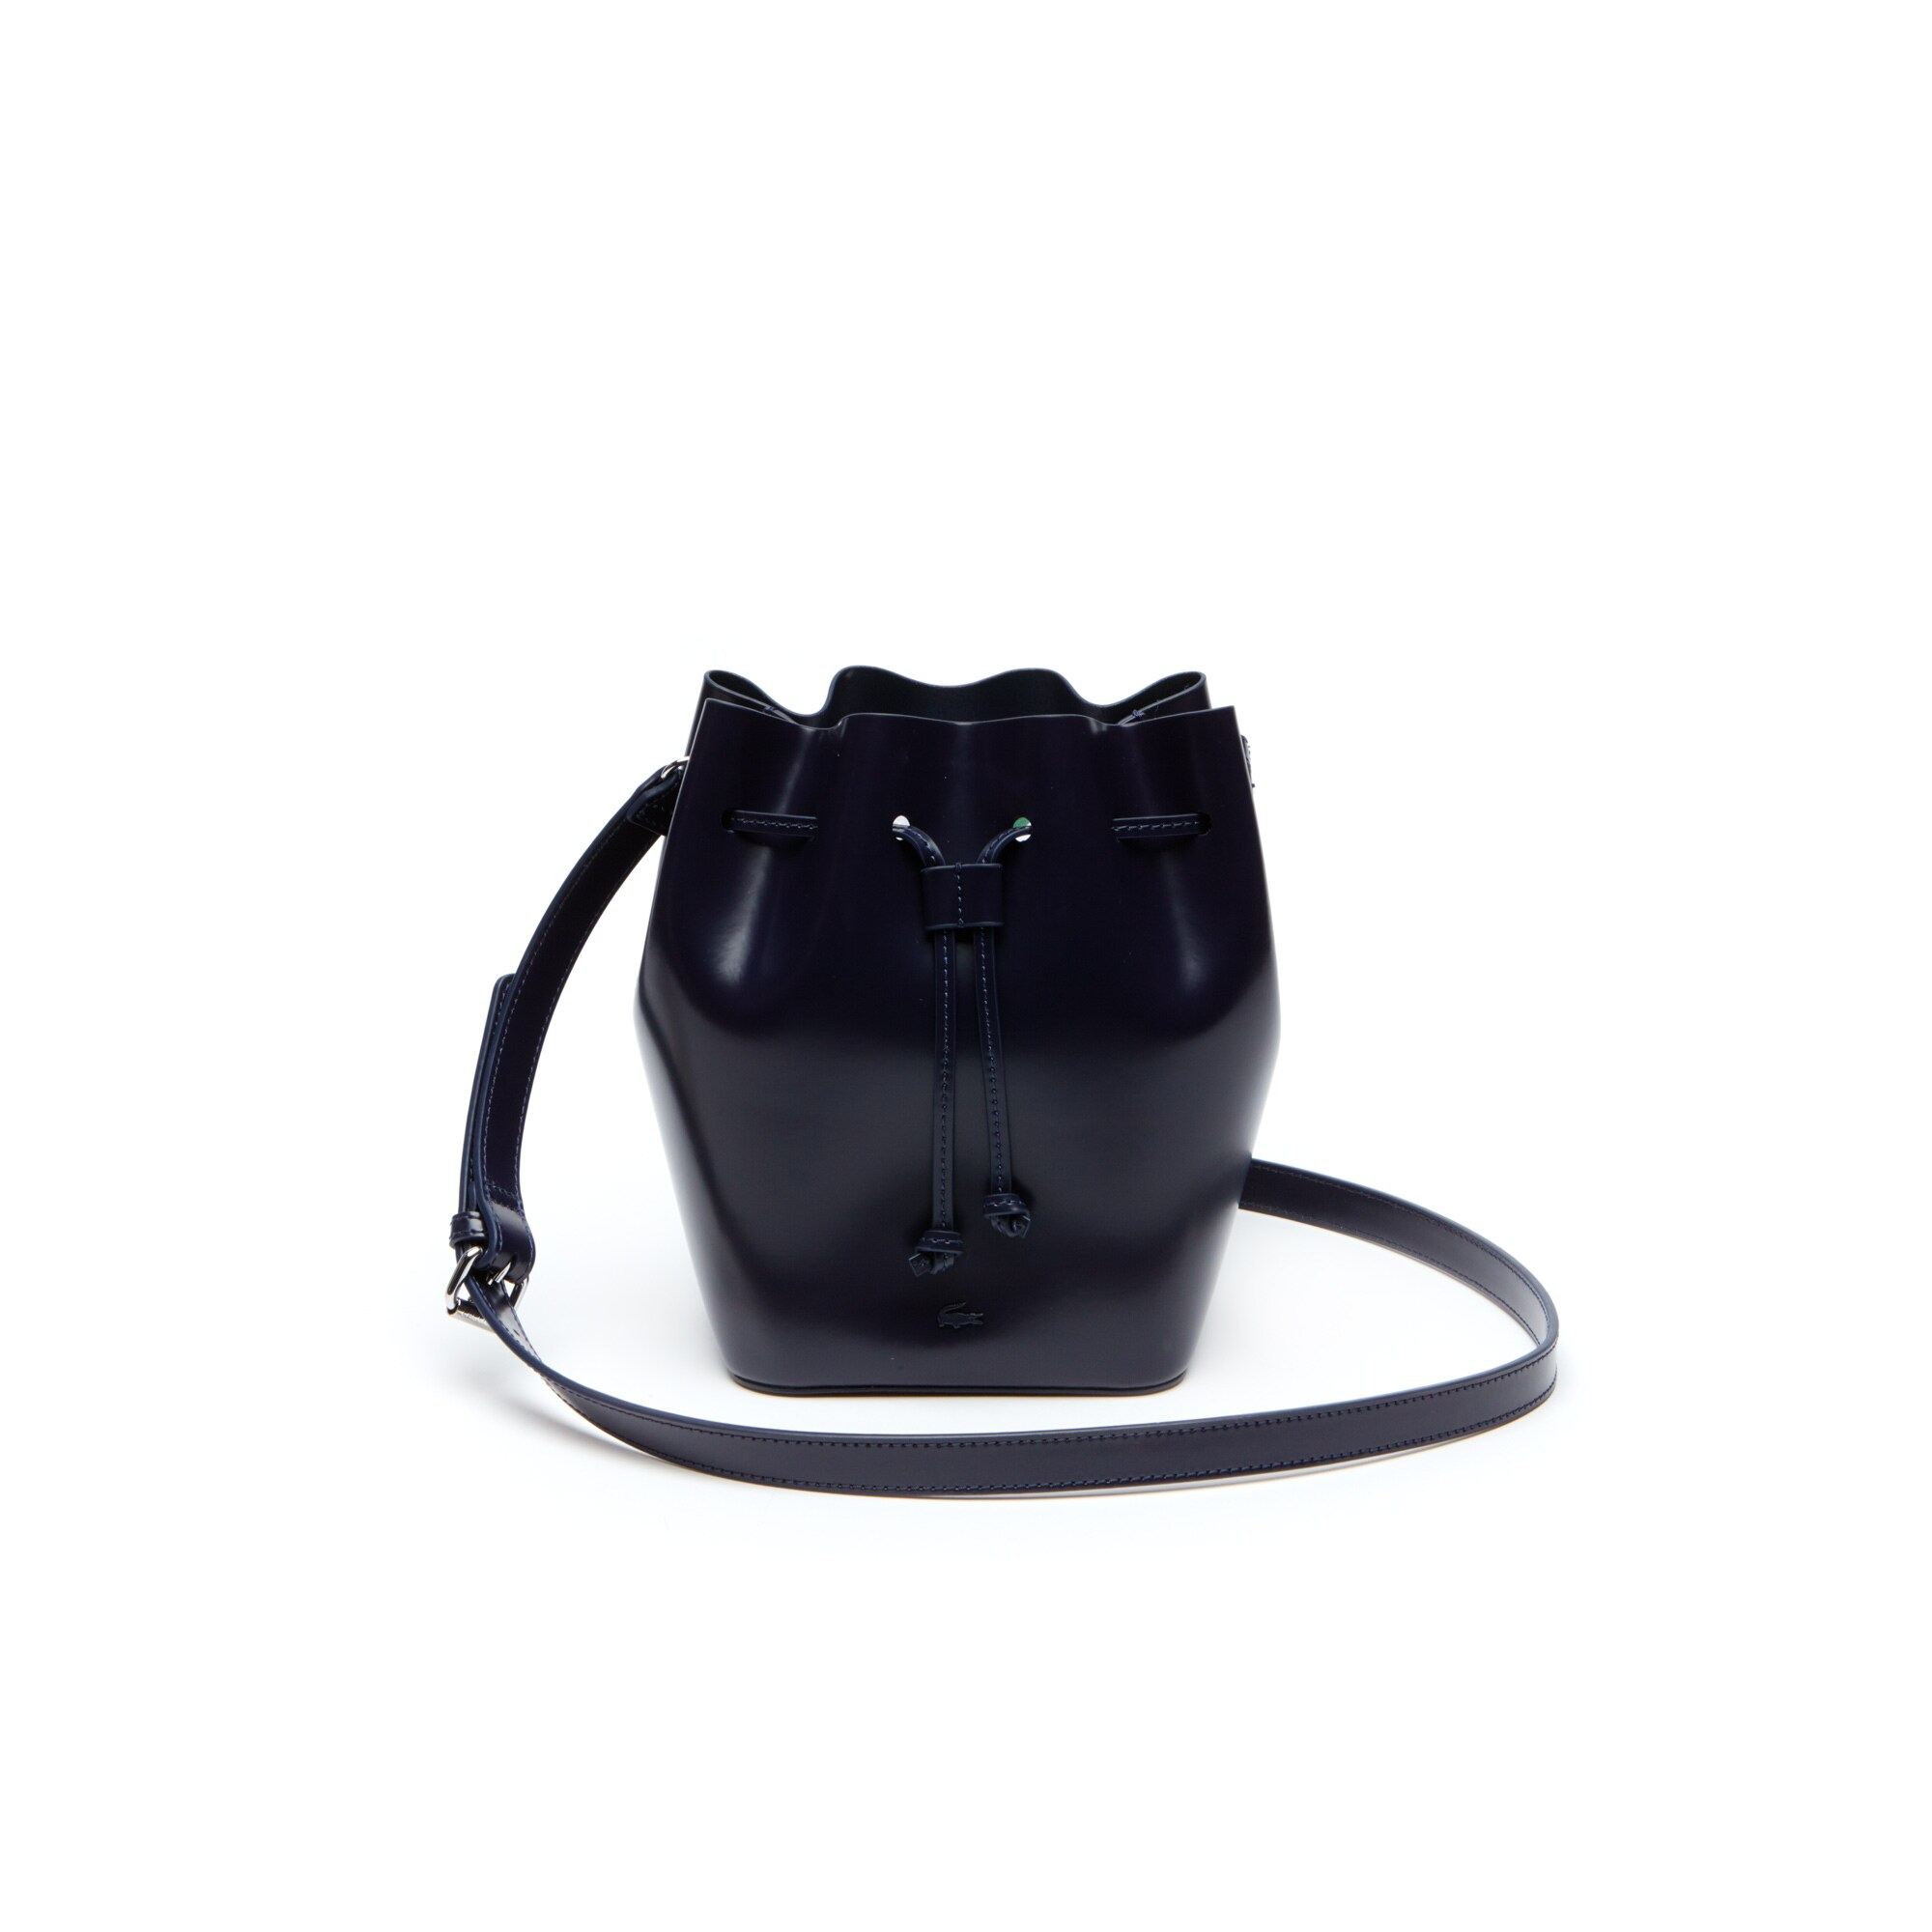 Damen-Beuteltasche MINI GOLF aus glänzendem Leder